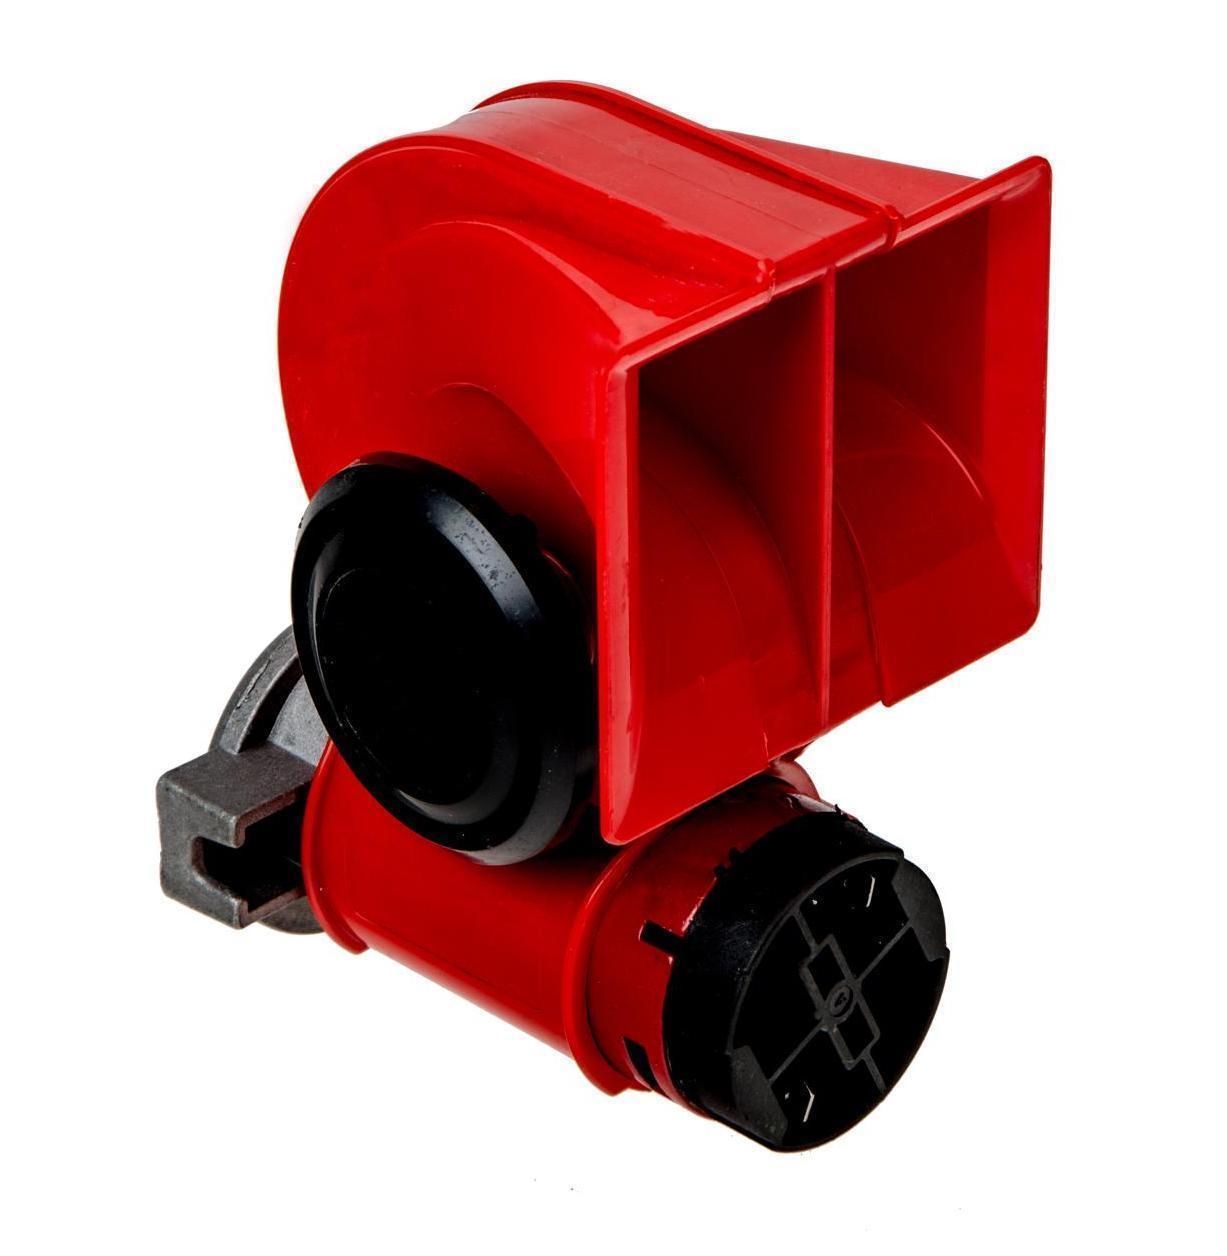 Onpira Kompresorový klakson - AUTO fanfára 12V, 139 dB